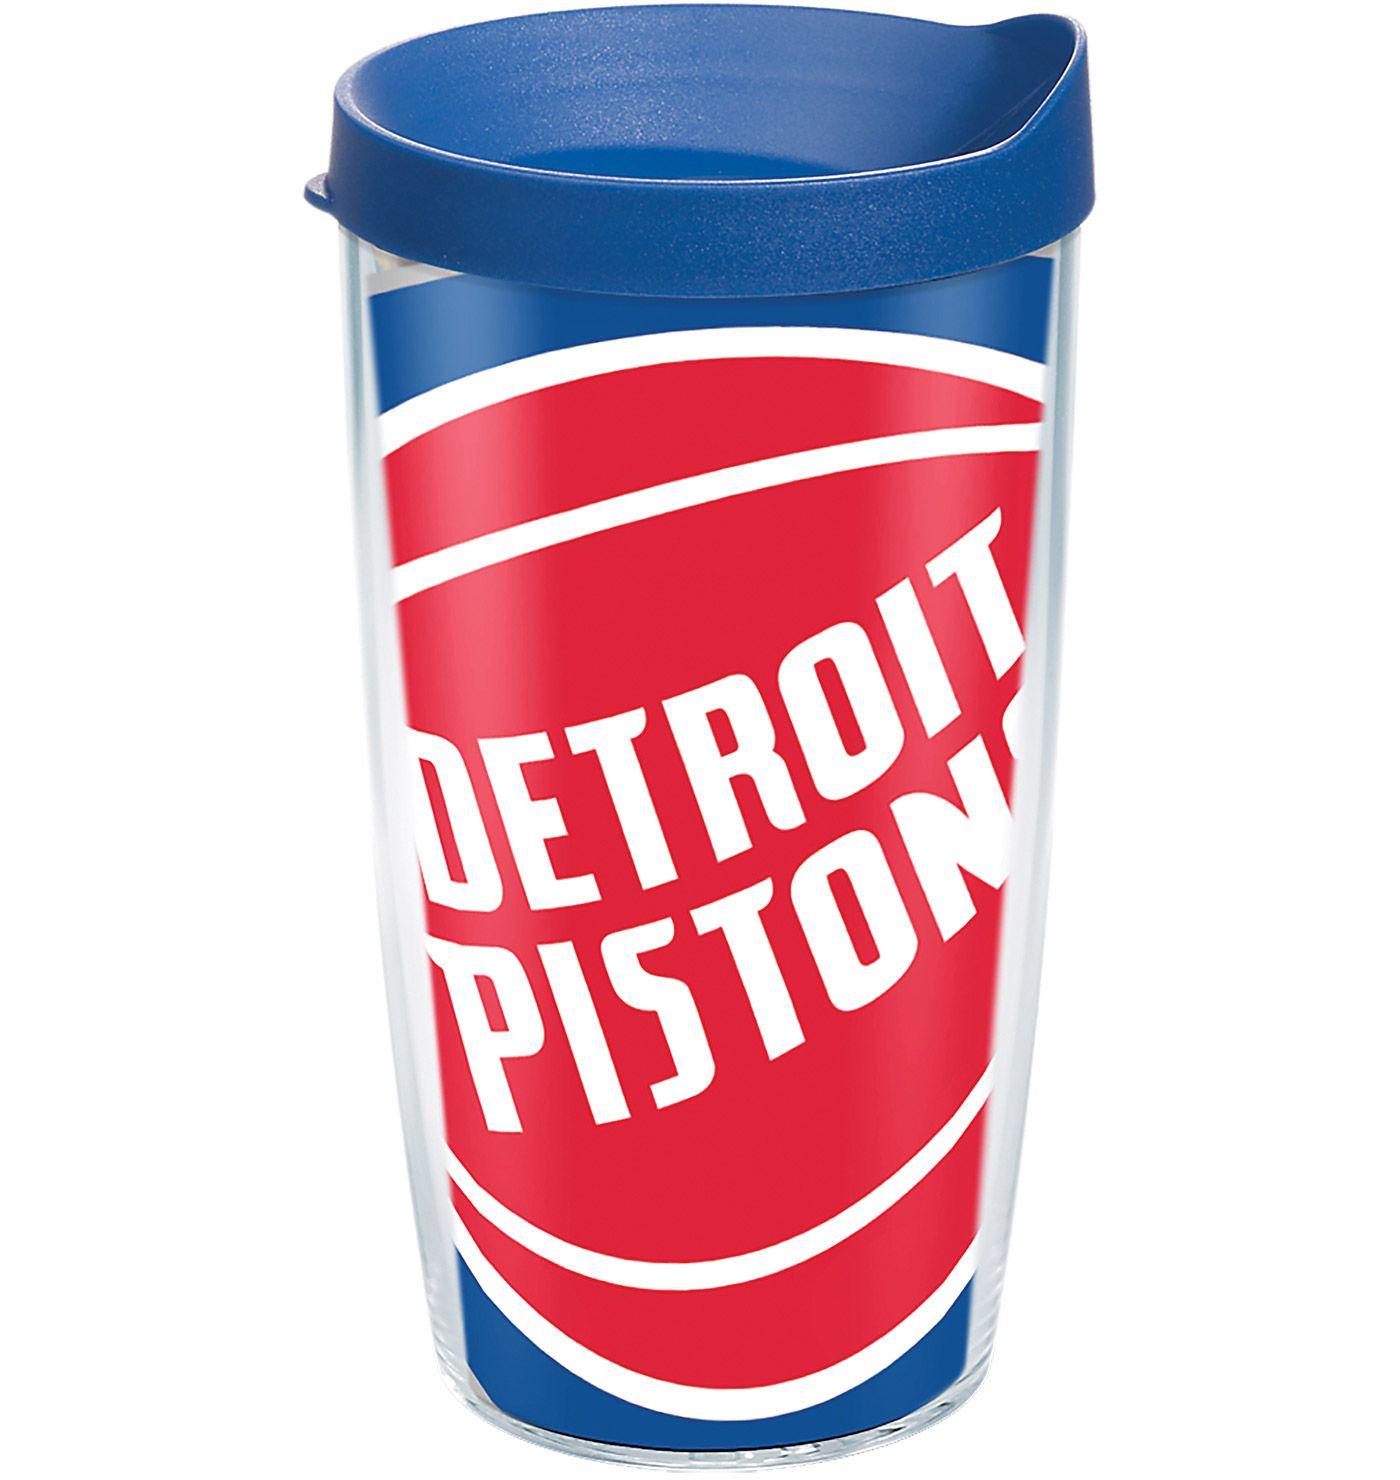 Tervis Detroit Pistons 16oz. Colossal Tumbler